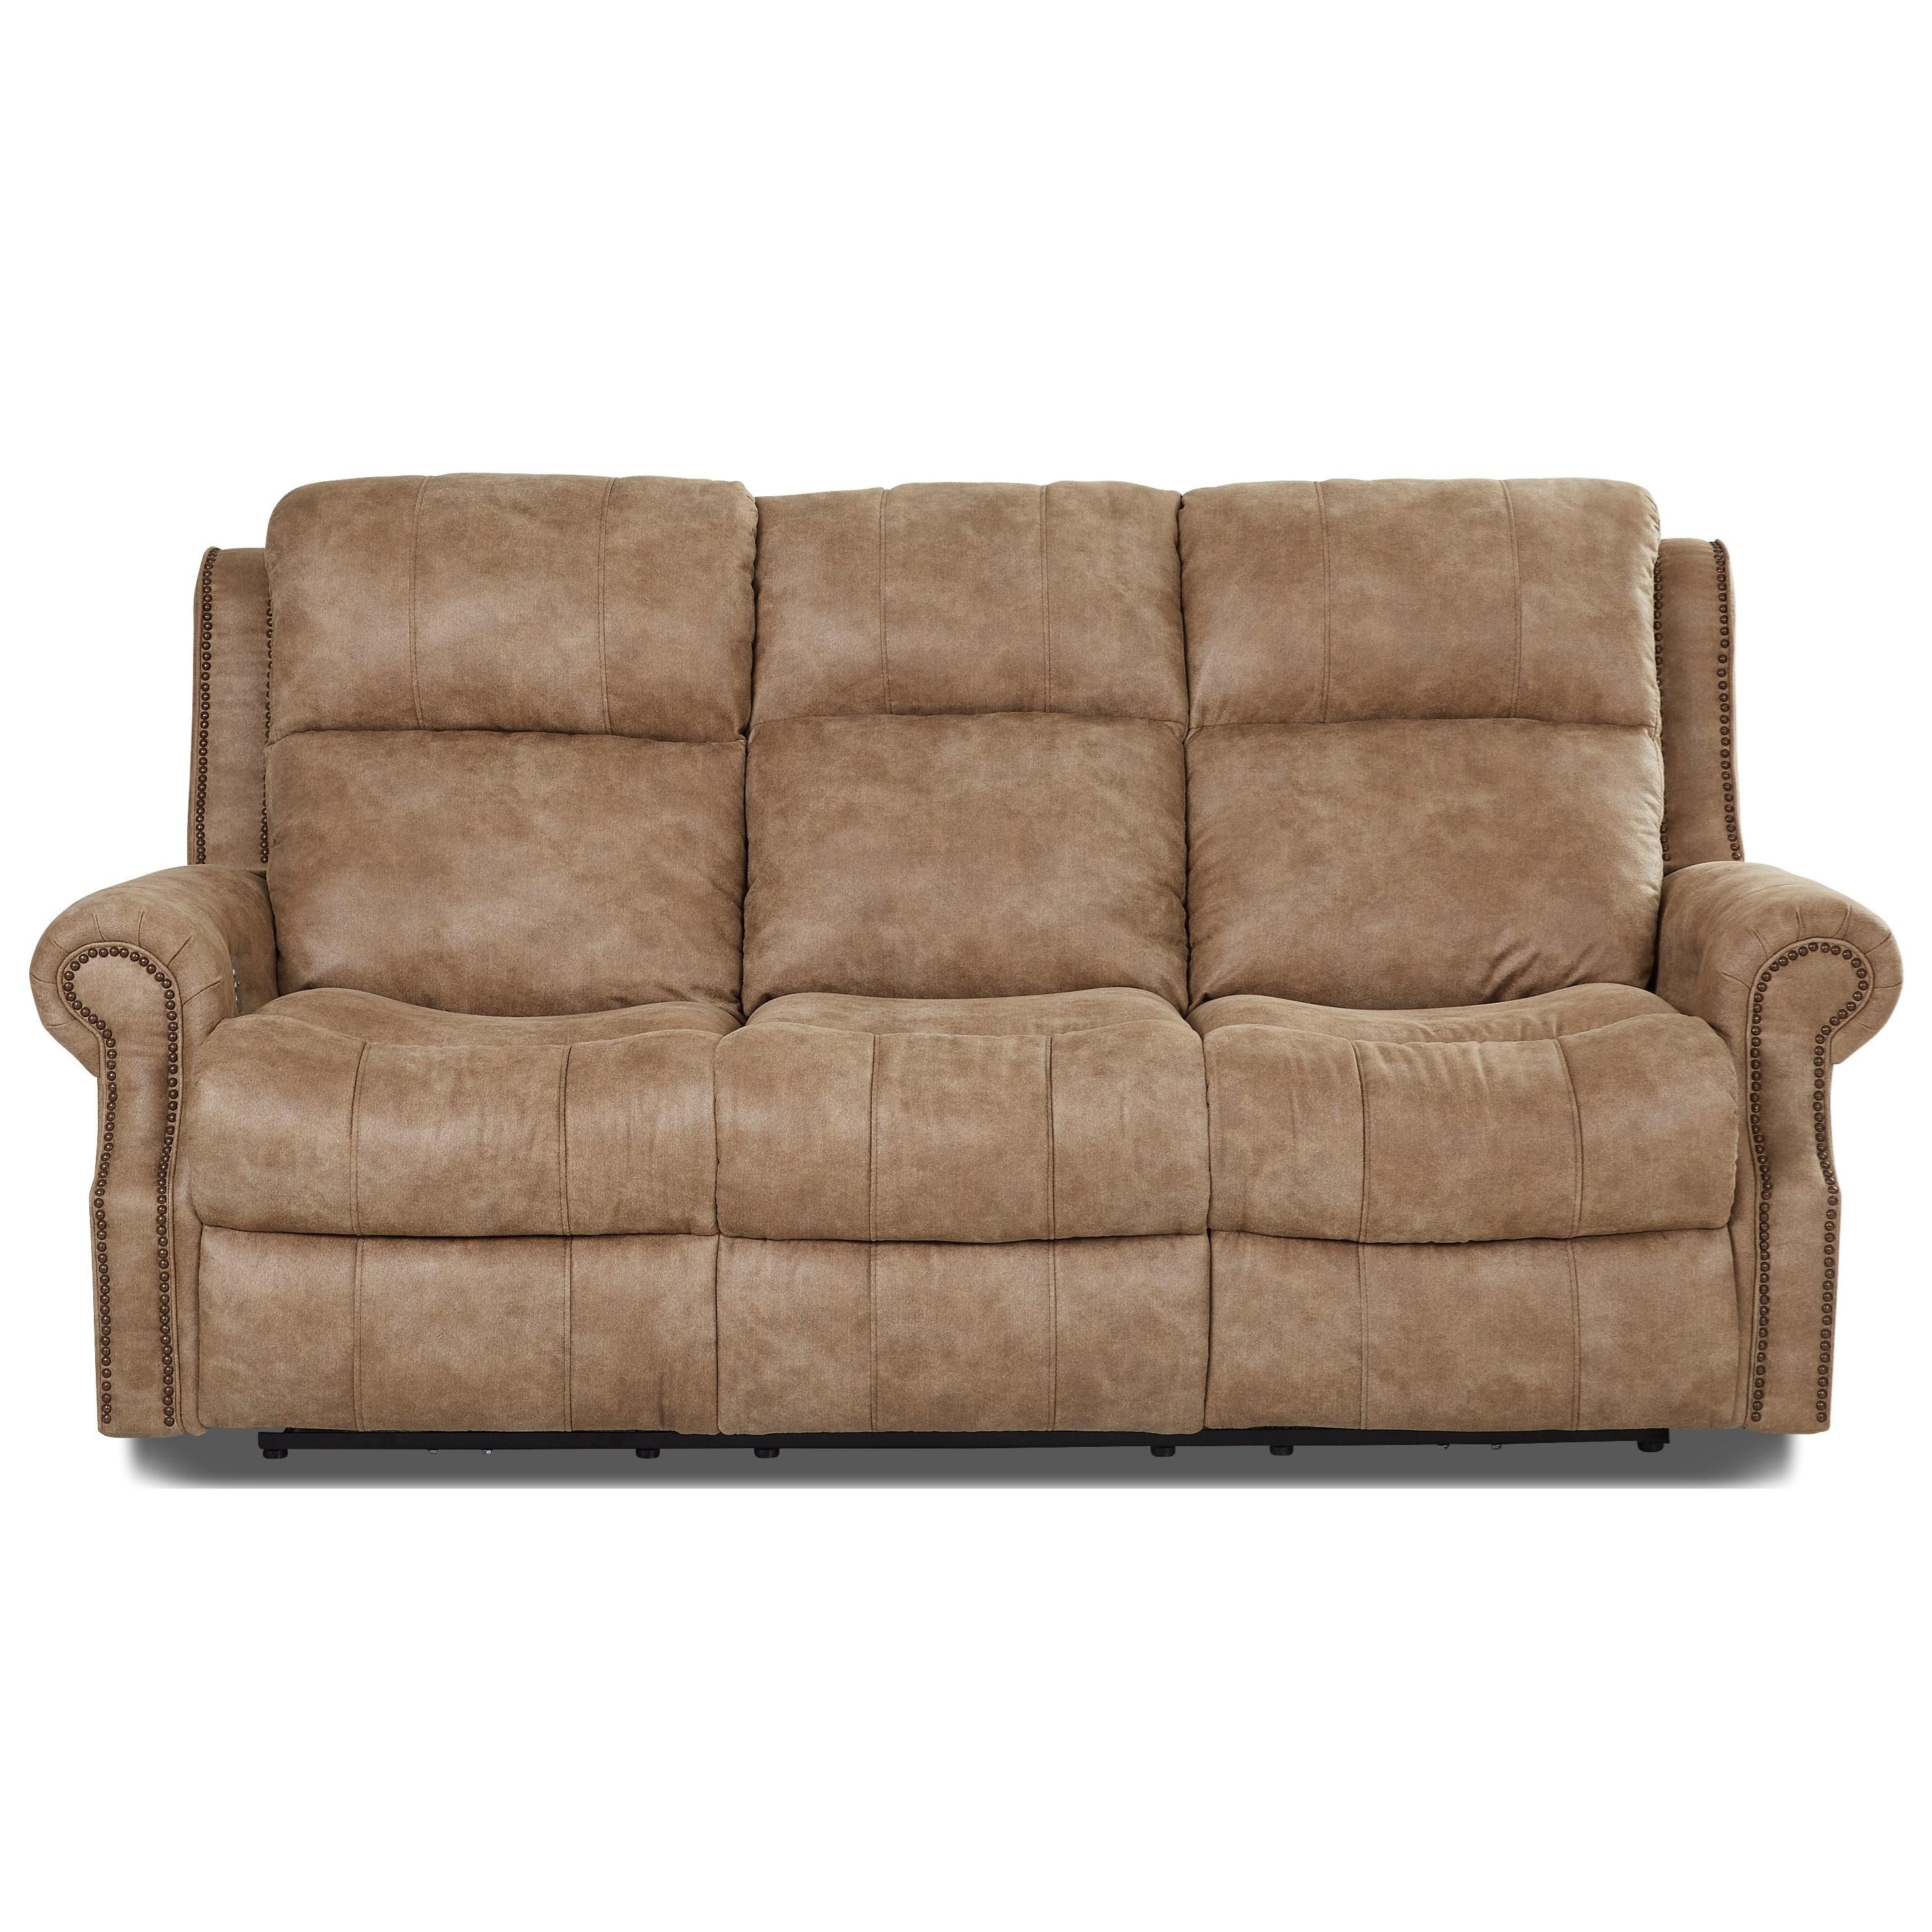 Klaussner Vivio Traditional Power Reclining Sofa with Nailheads